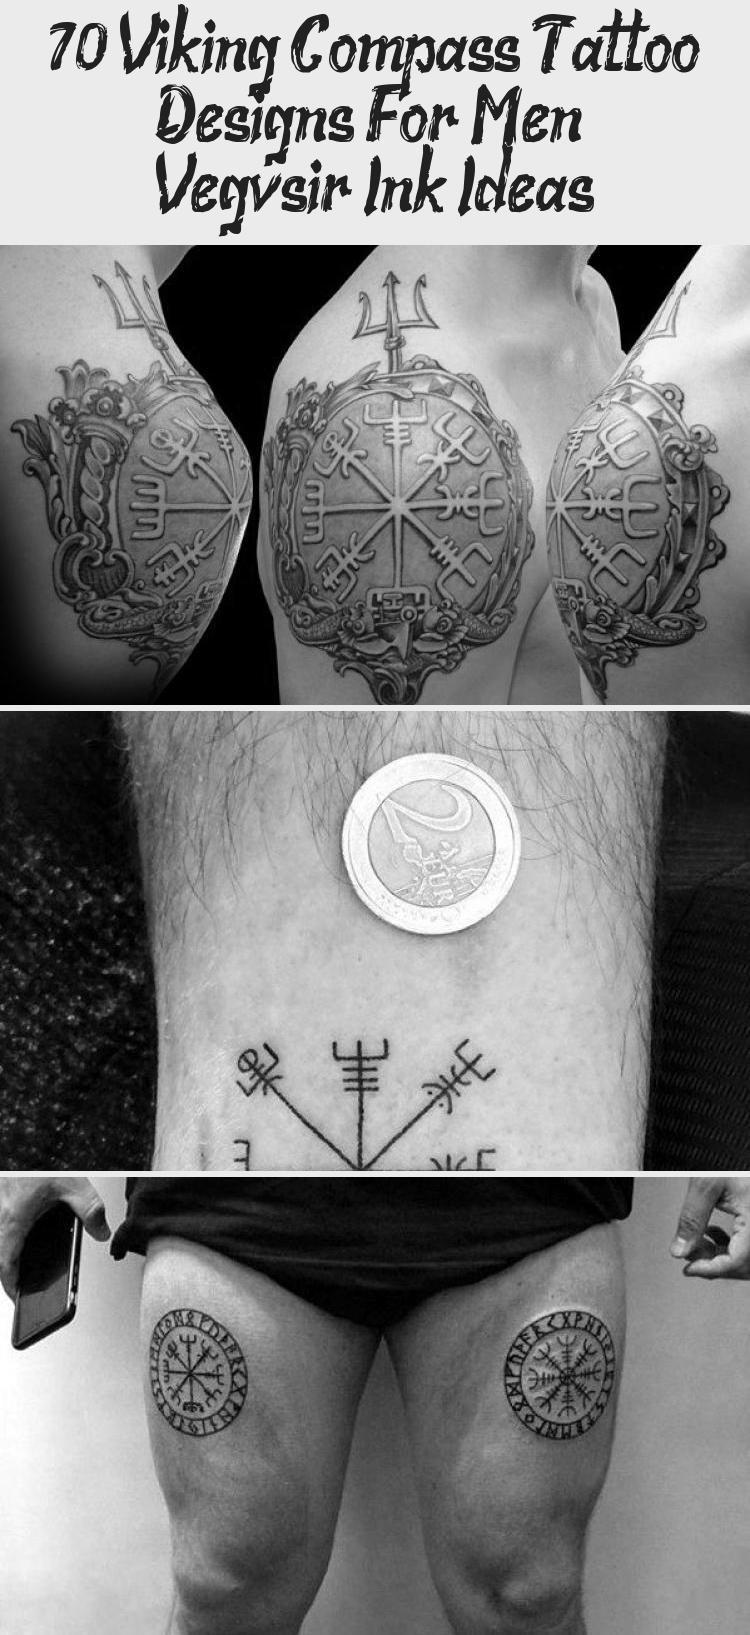 70 Viking Compass Tattoo Designs For Men Vegvísir Ink